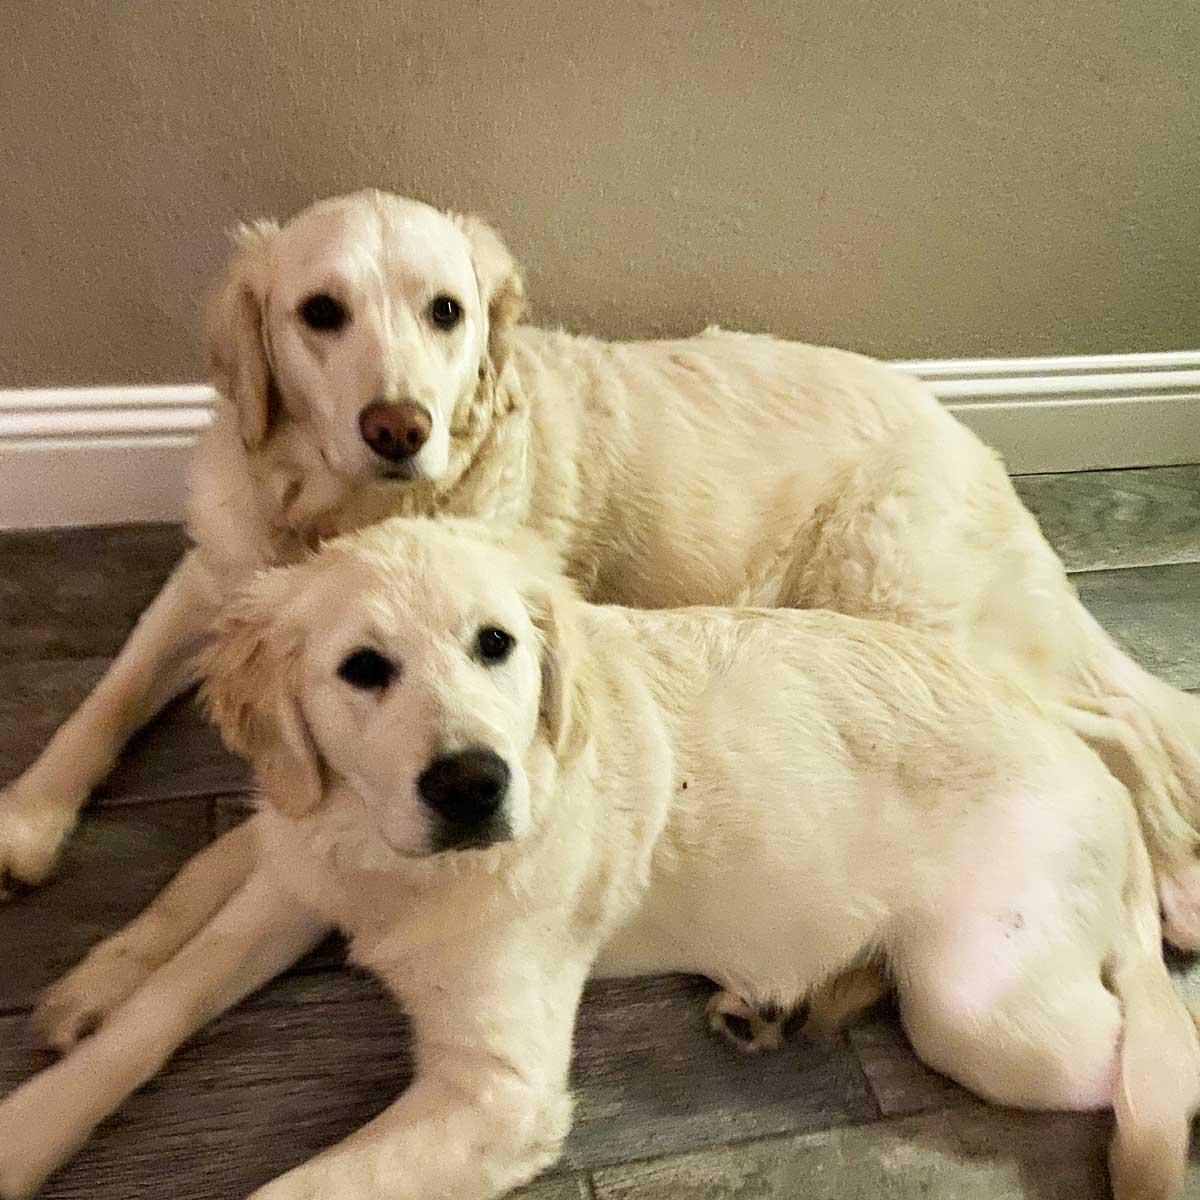 Ivy & Skye the Golden Retrievers